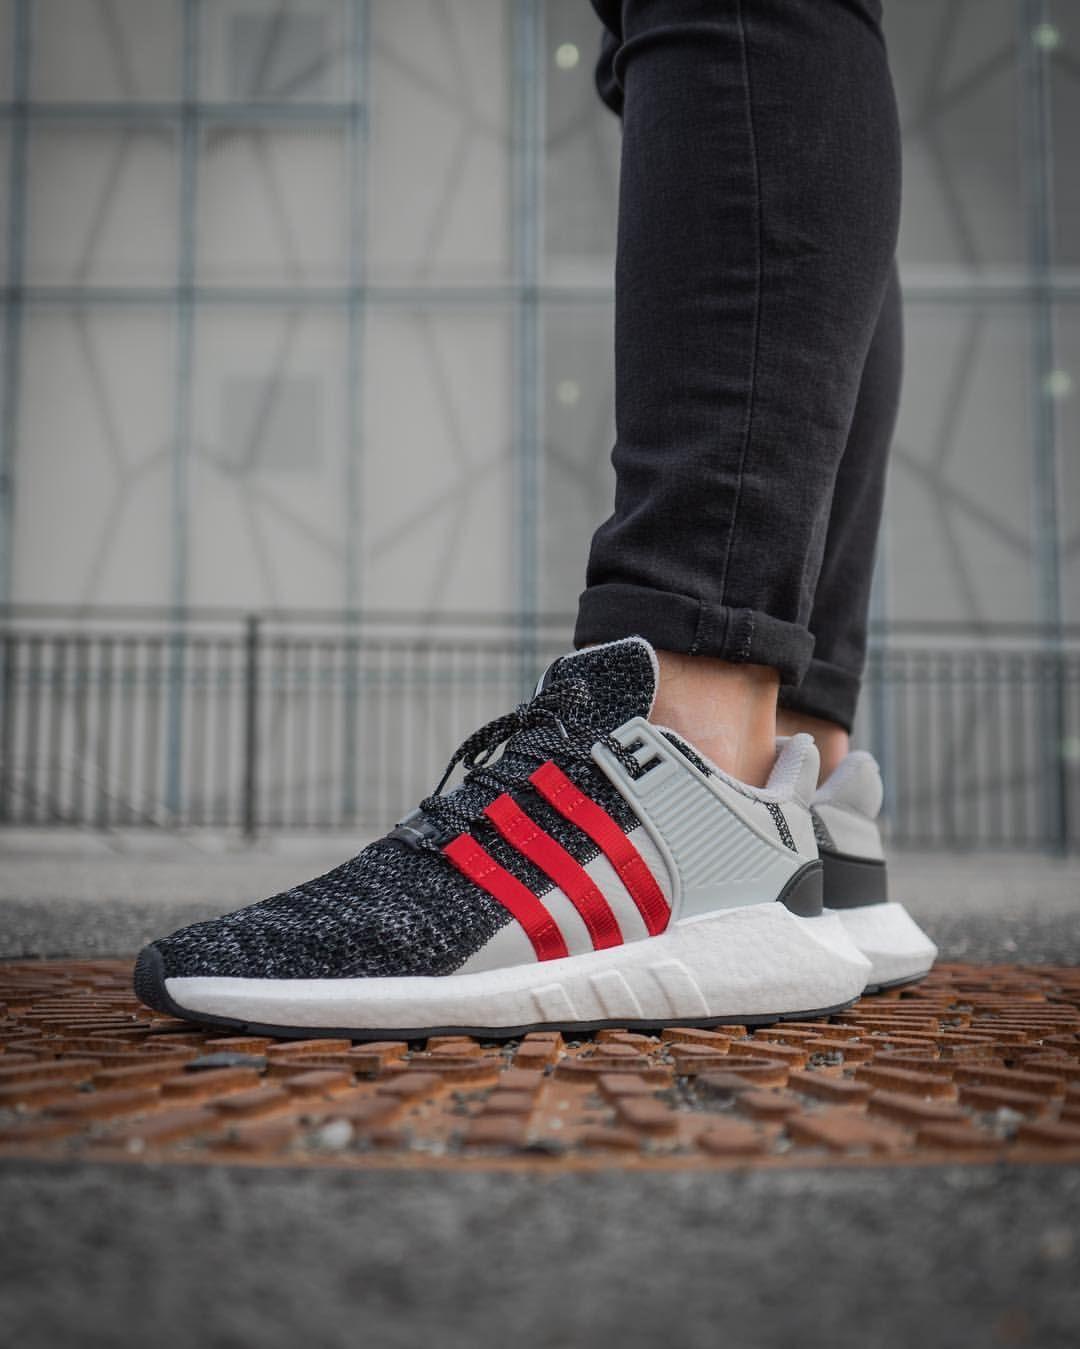 Adidas Coat Overkill X Eqt Of Future ArmsSneakers Support kOPiuXZ